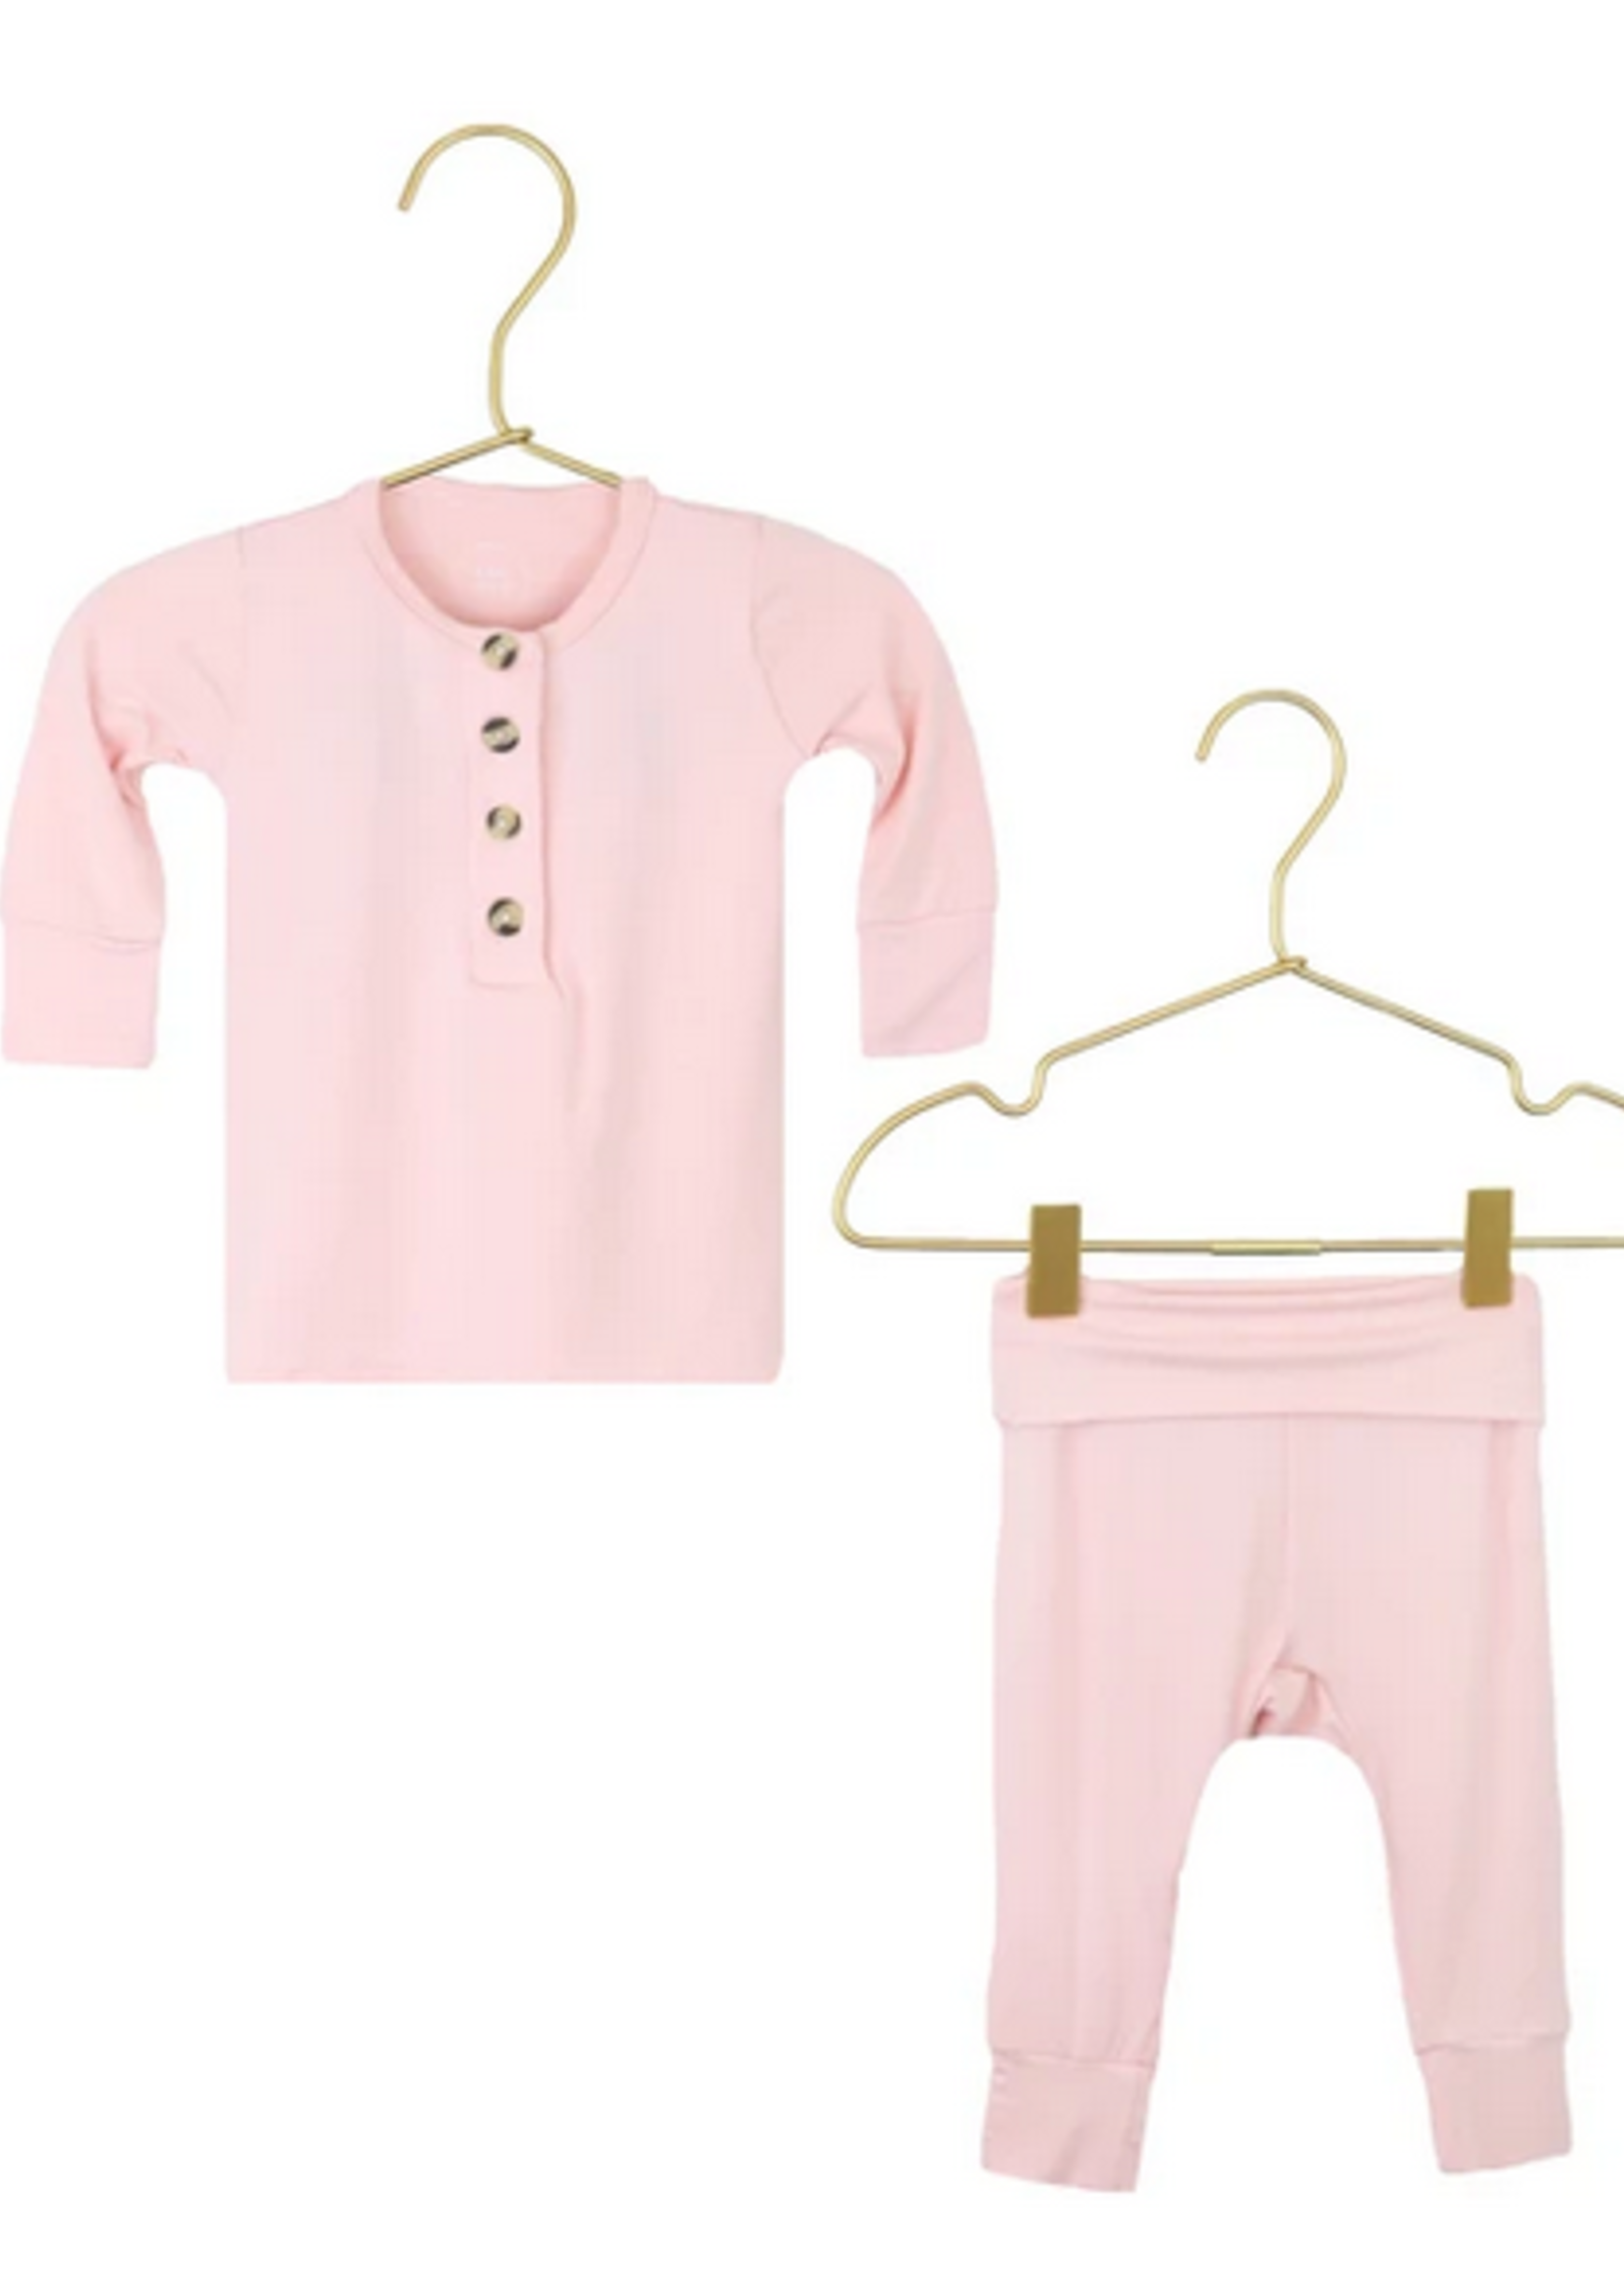 Elitaire Petite Ava Pink Set 3-6 Month